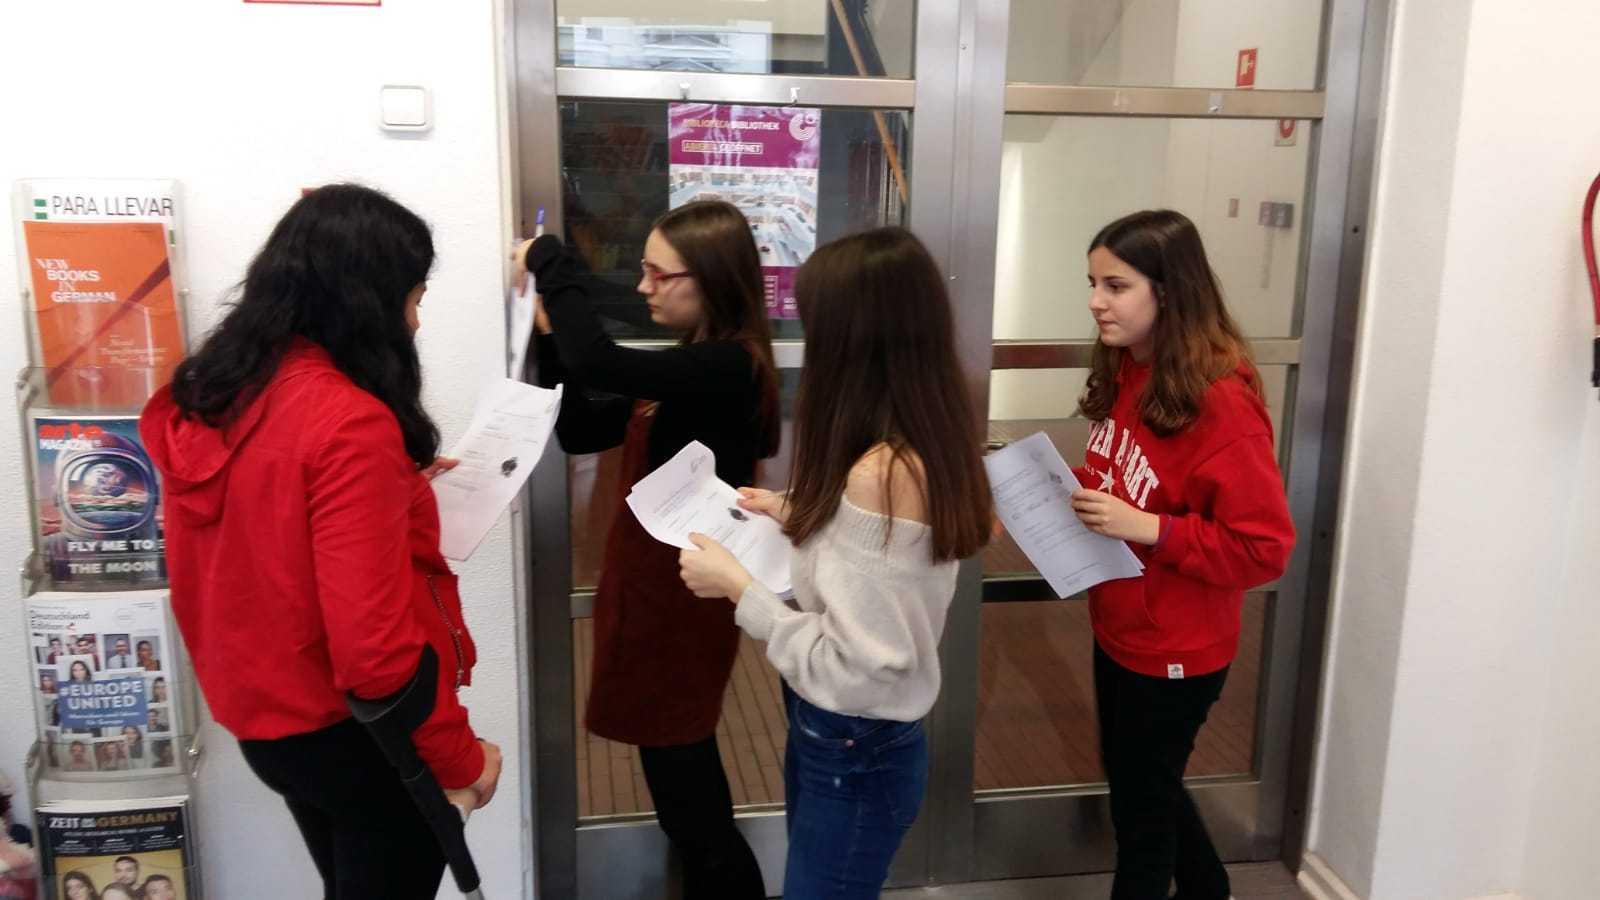 Klassenbesuch_Goethe_Institut 7